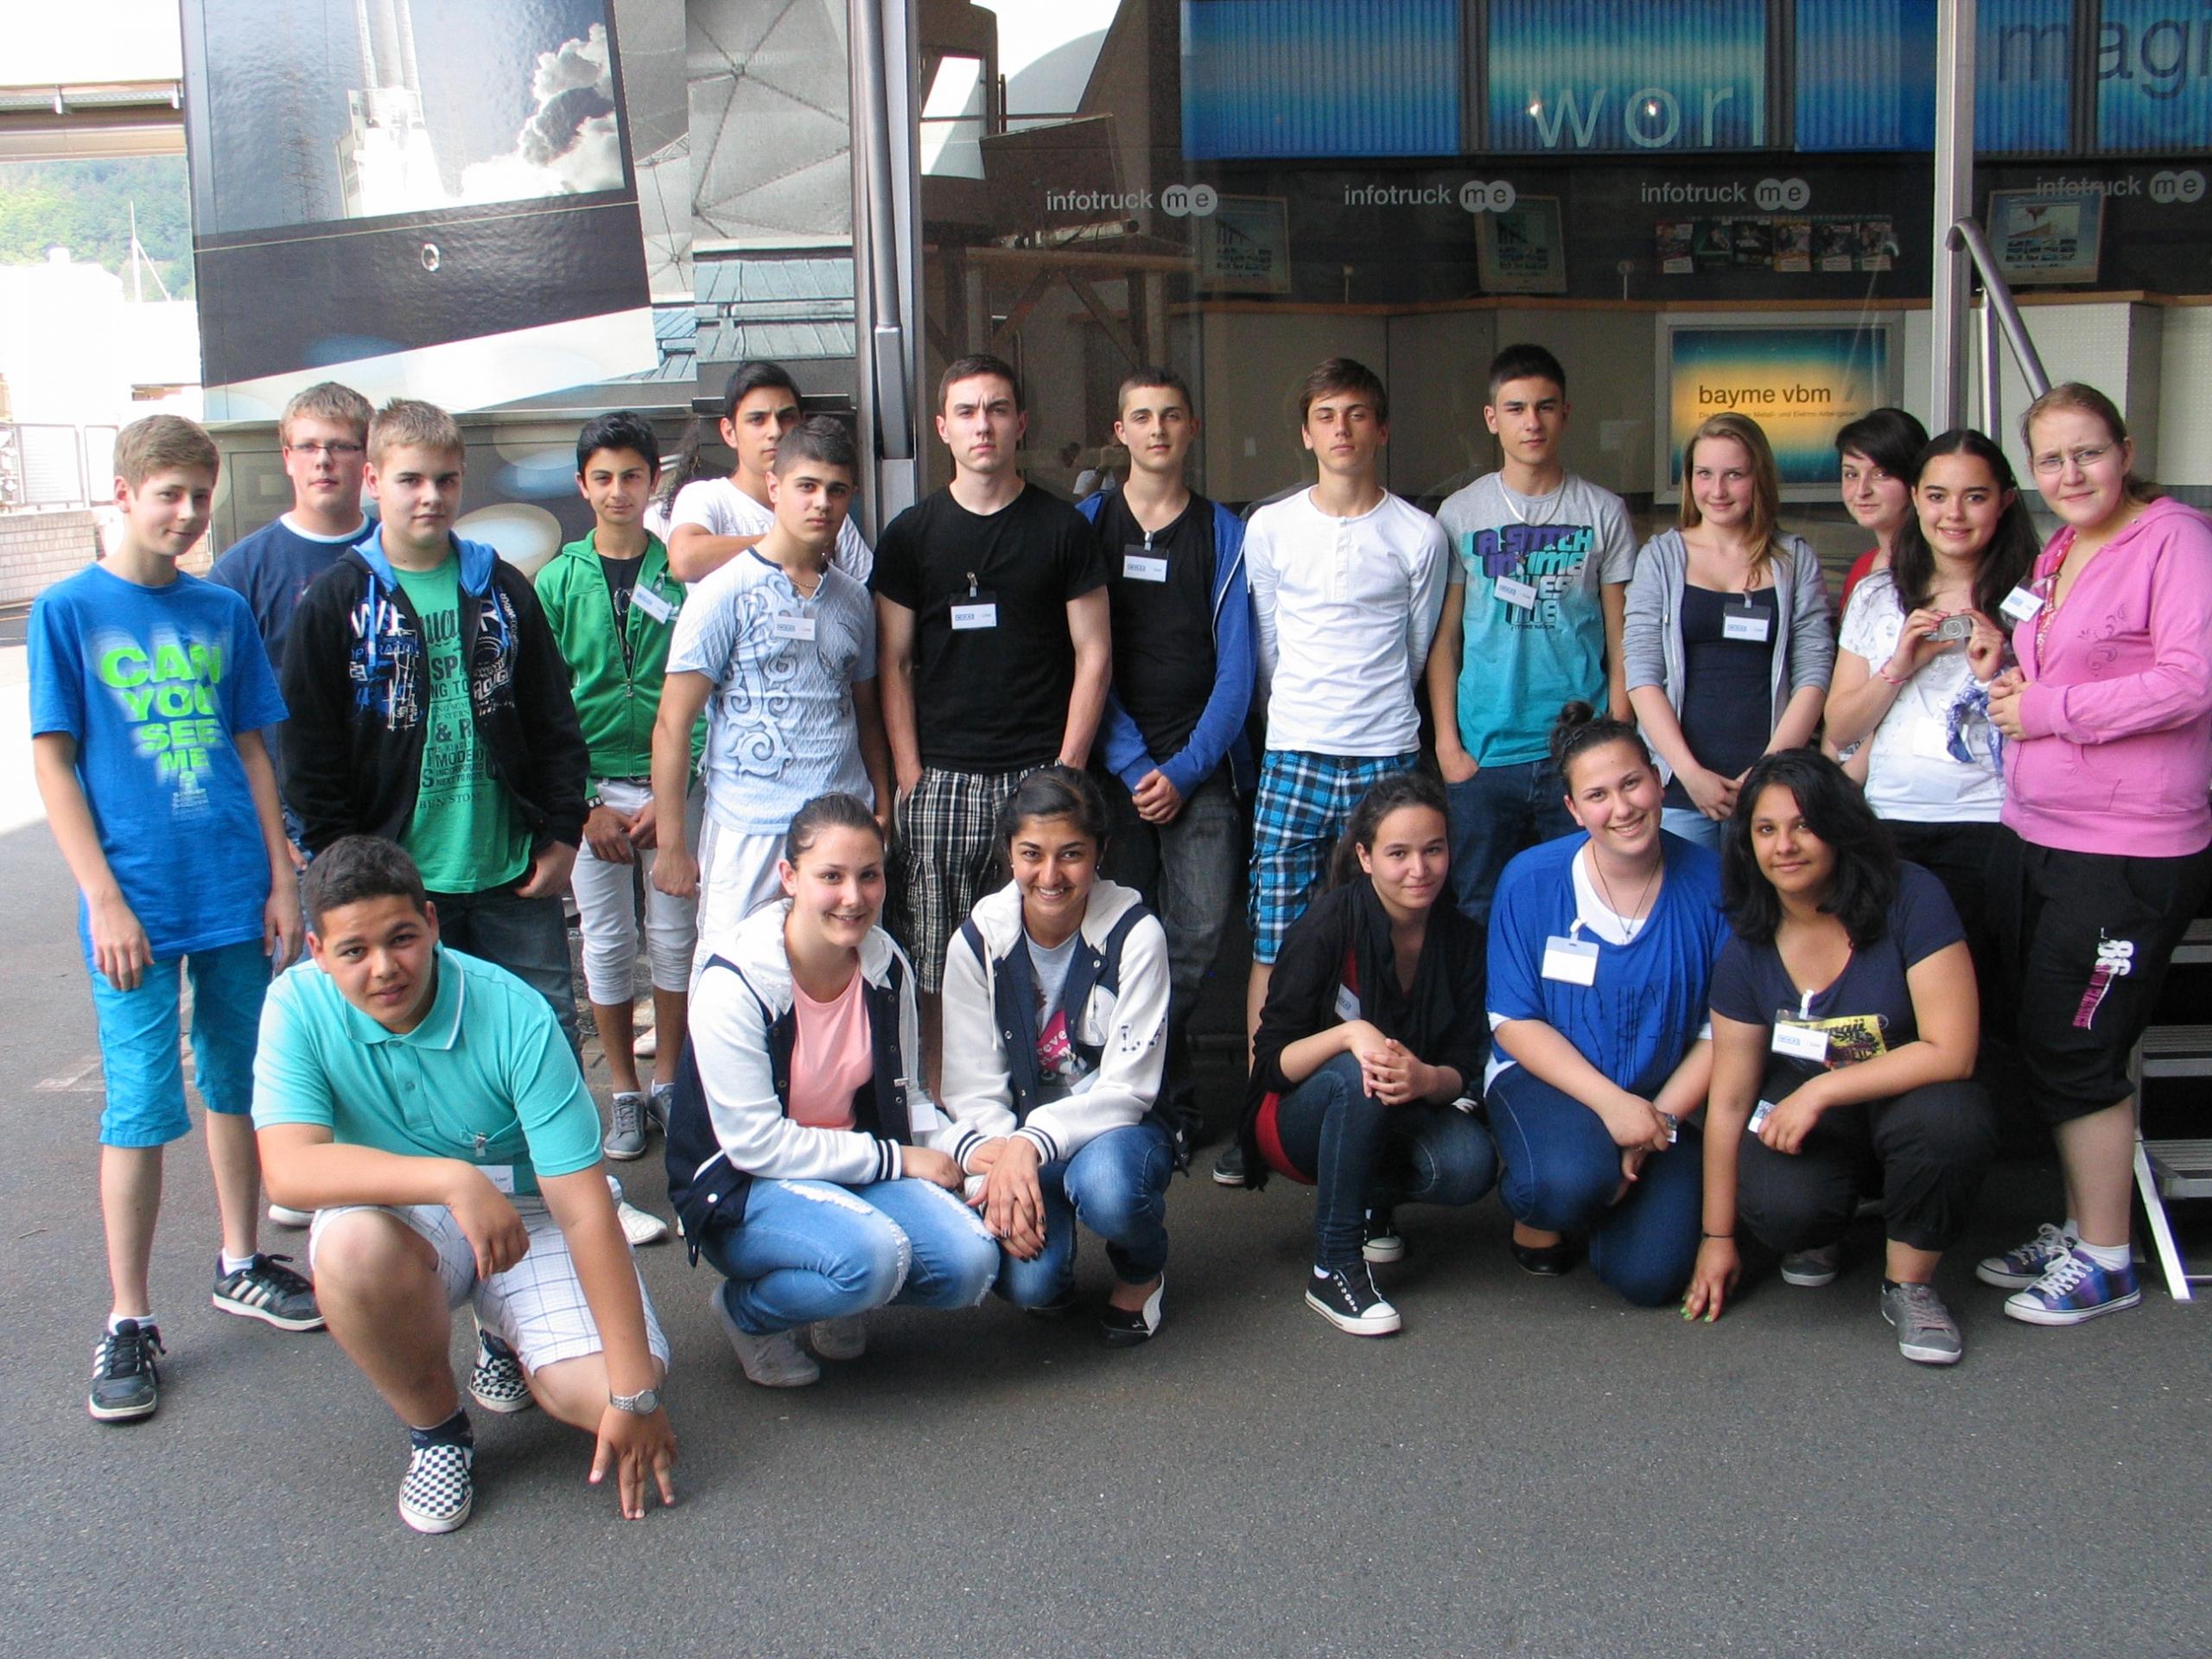 volksschule_klingenberg_1-scaled